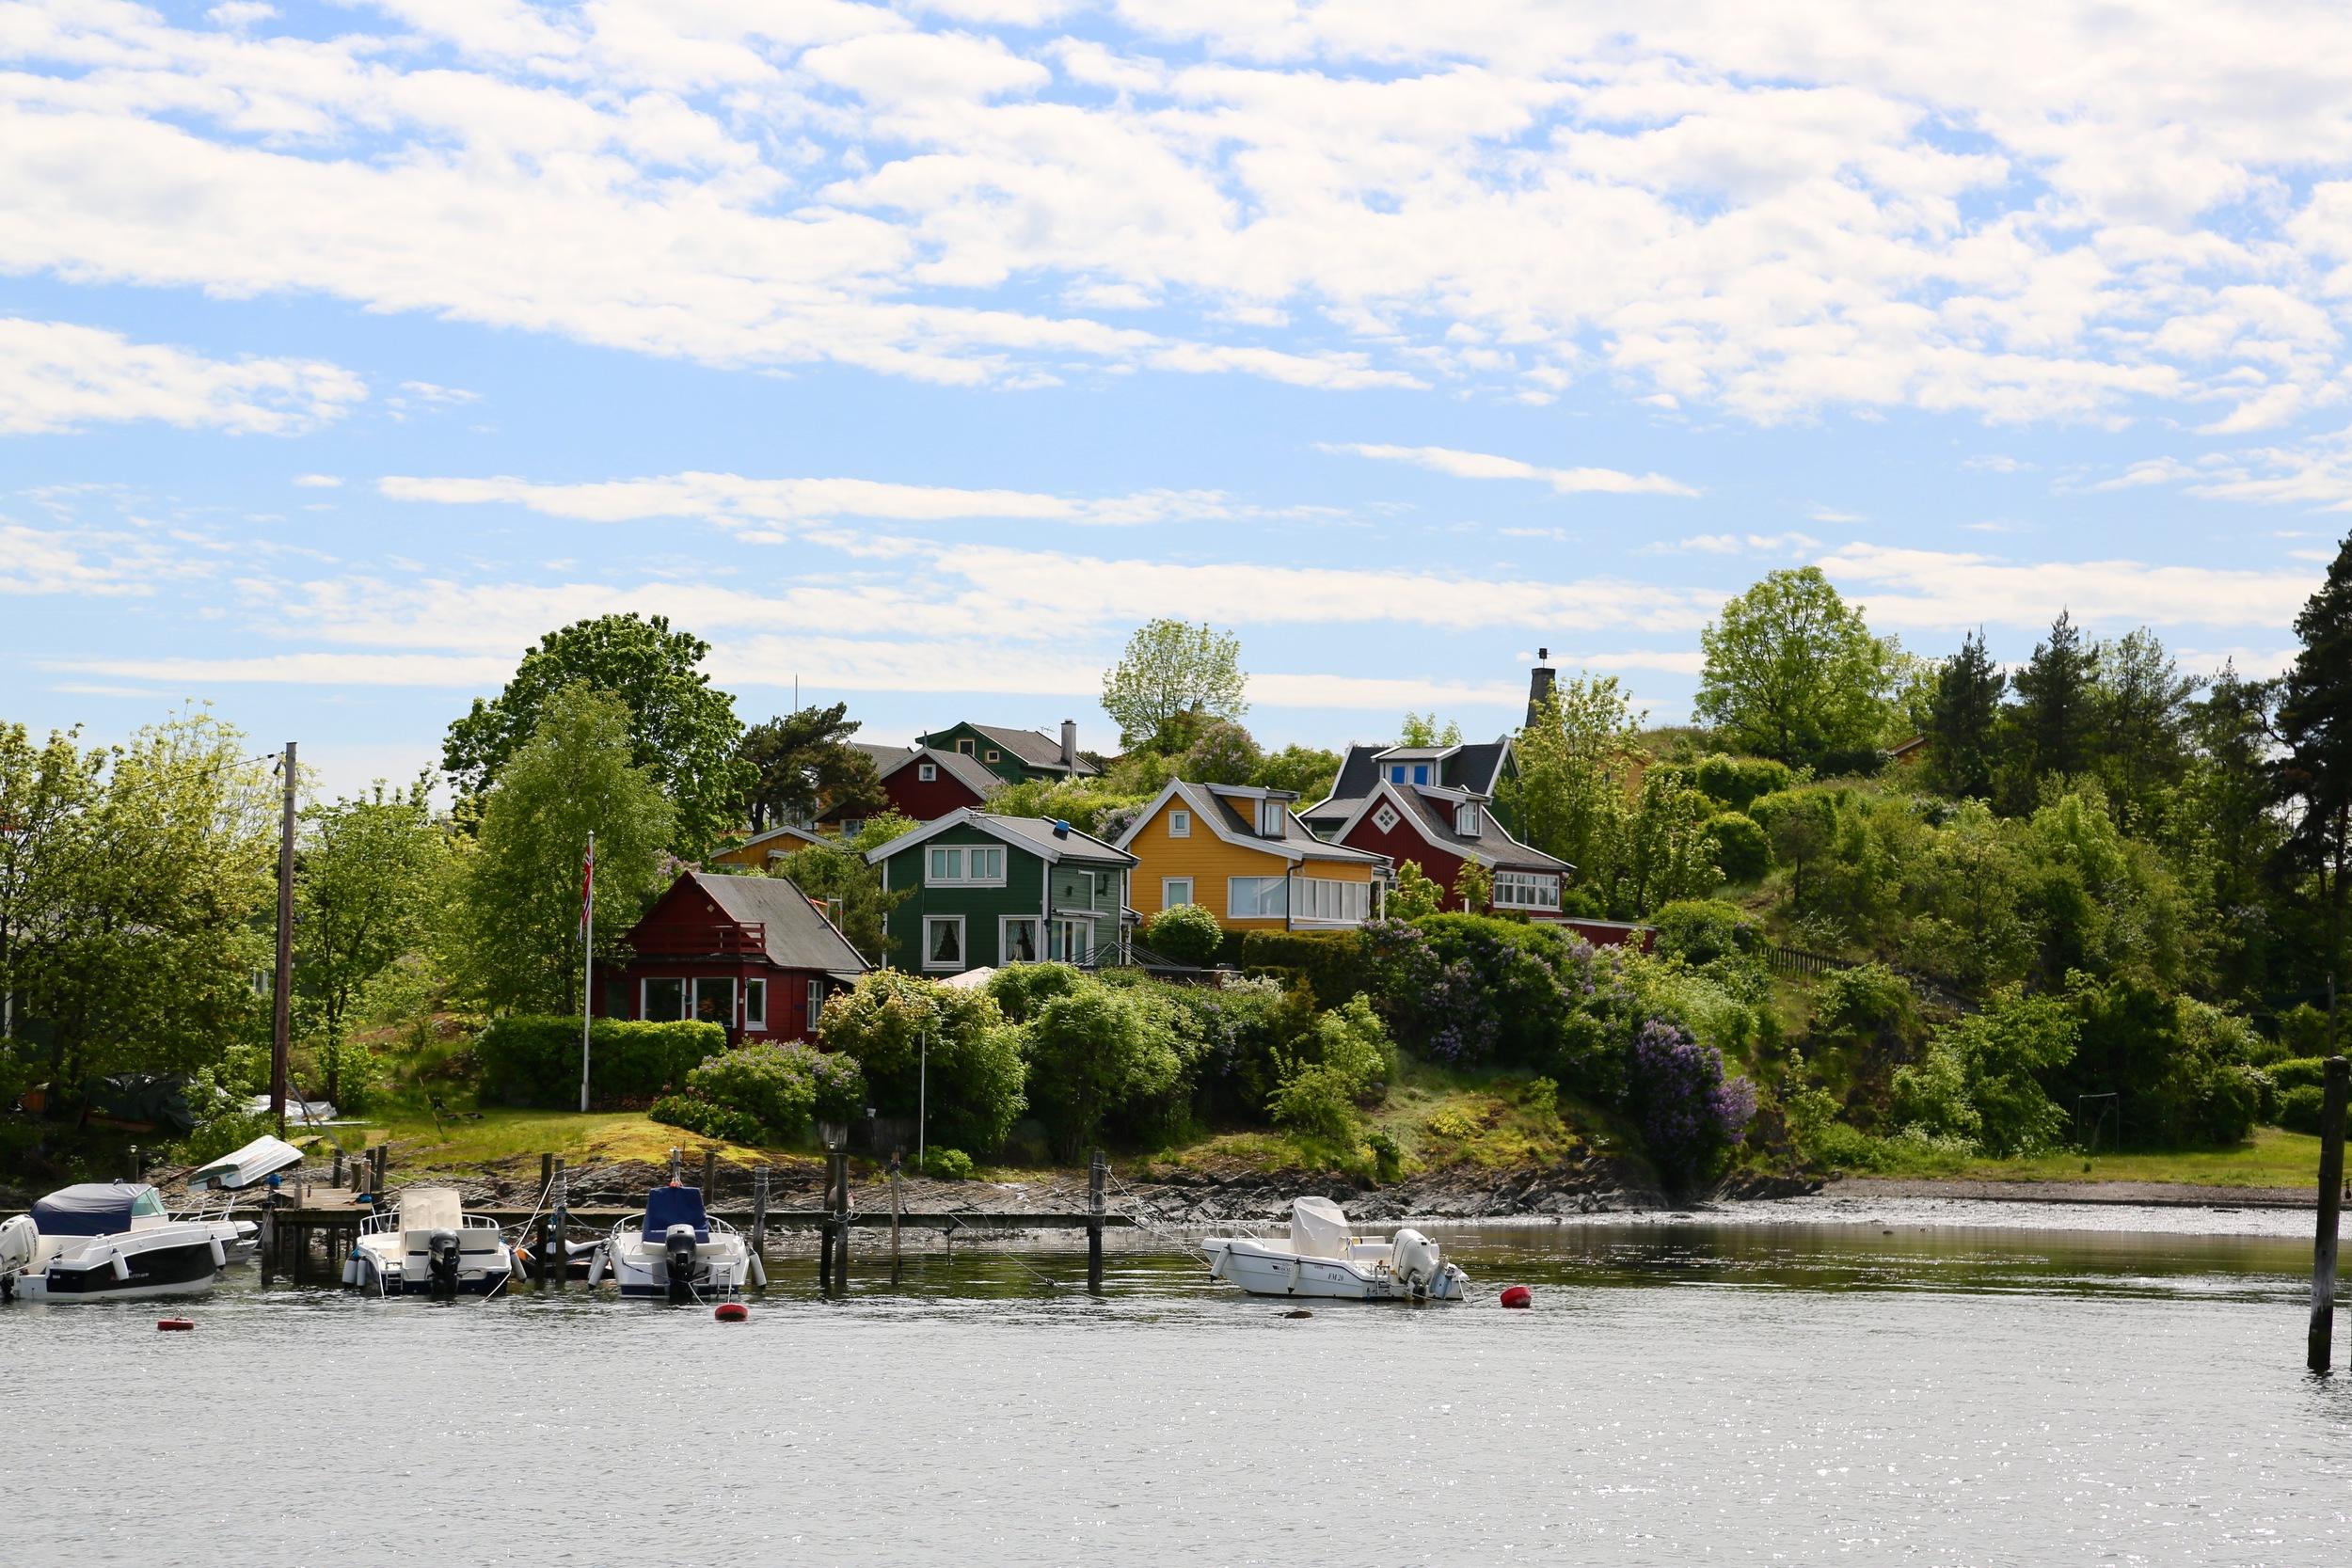 Fargerikt fellesskap på Lindøya. Foto: Odd Roar Lange